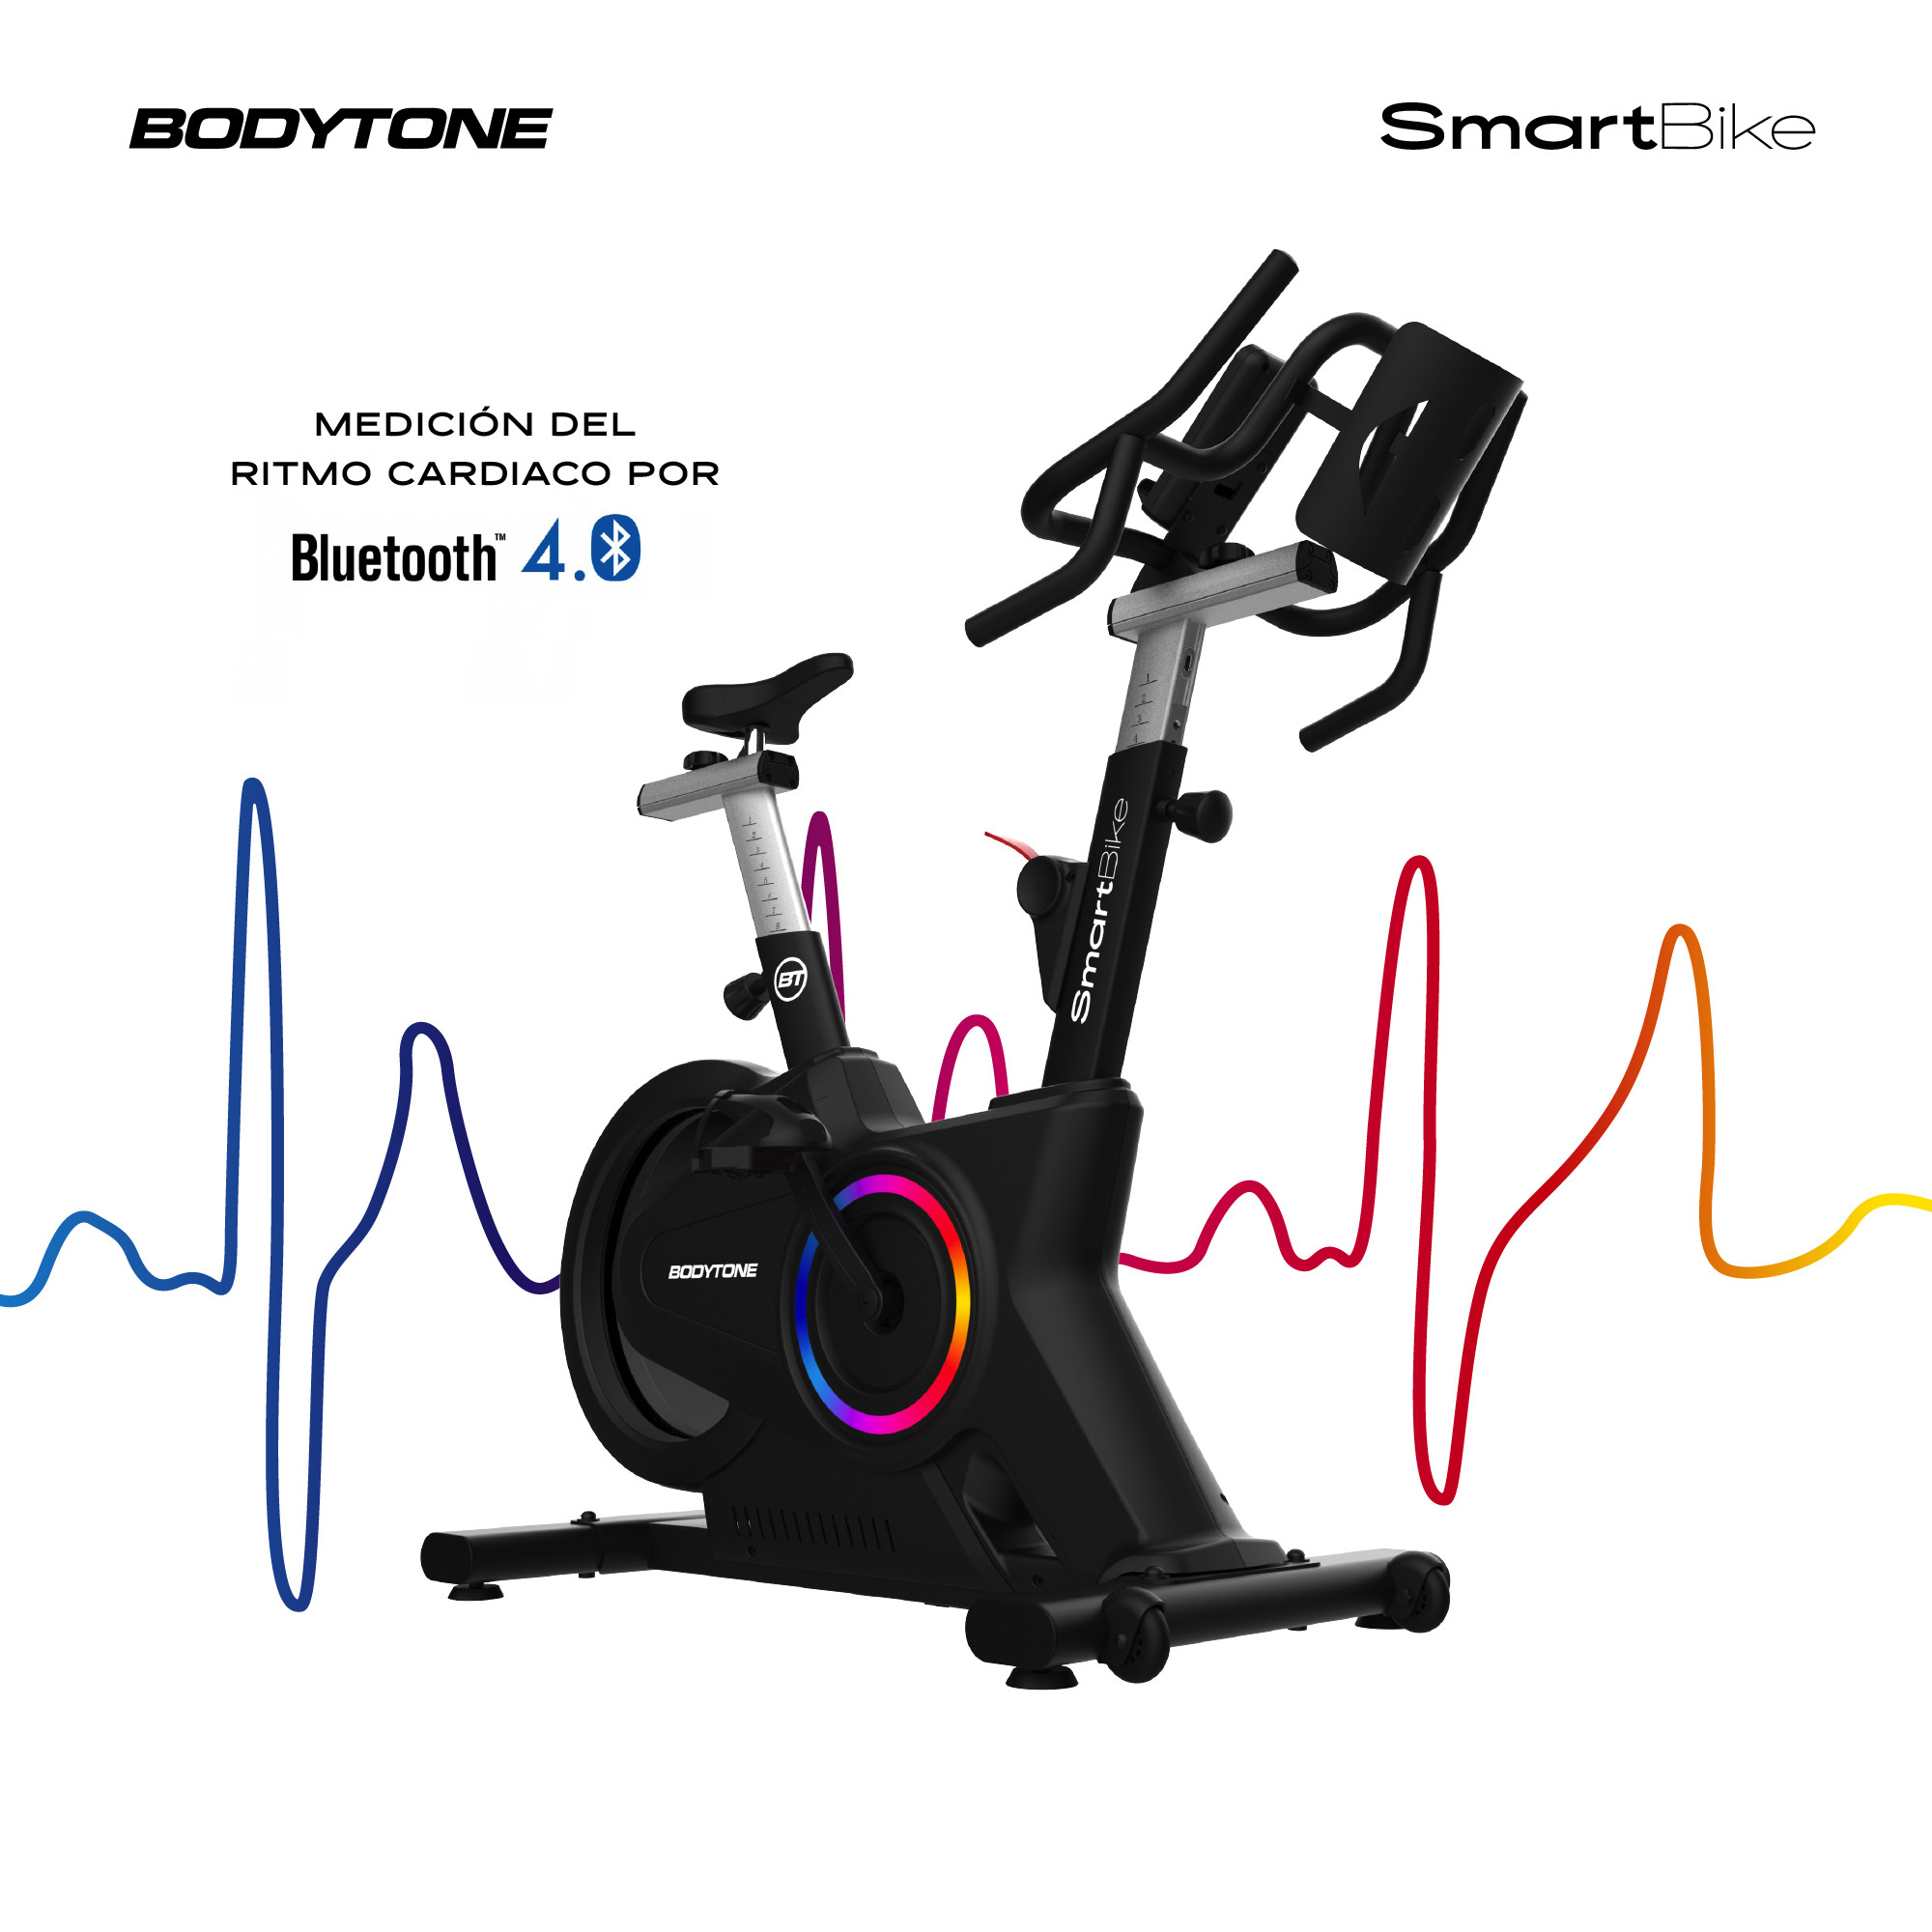 Frontal de Bodytone SMB1 V2 Smart Bike Ciclo Indoor